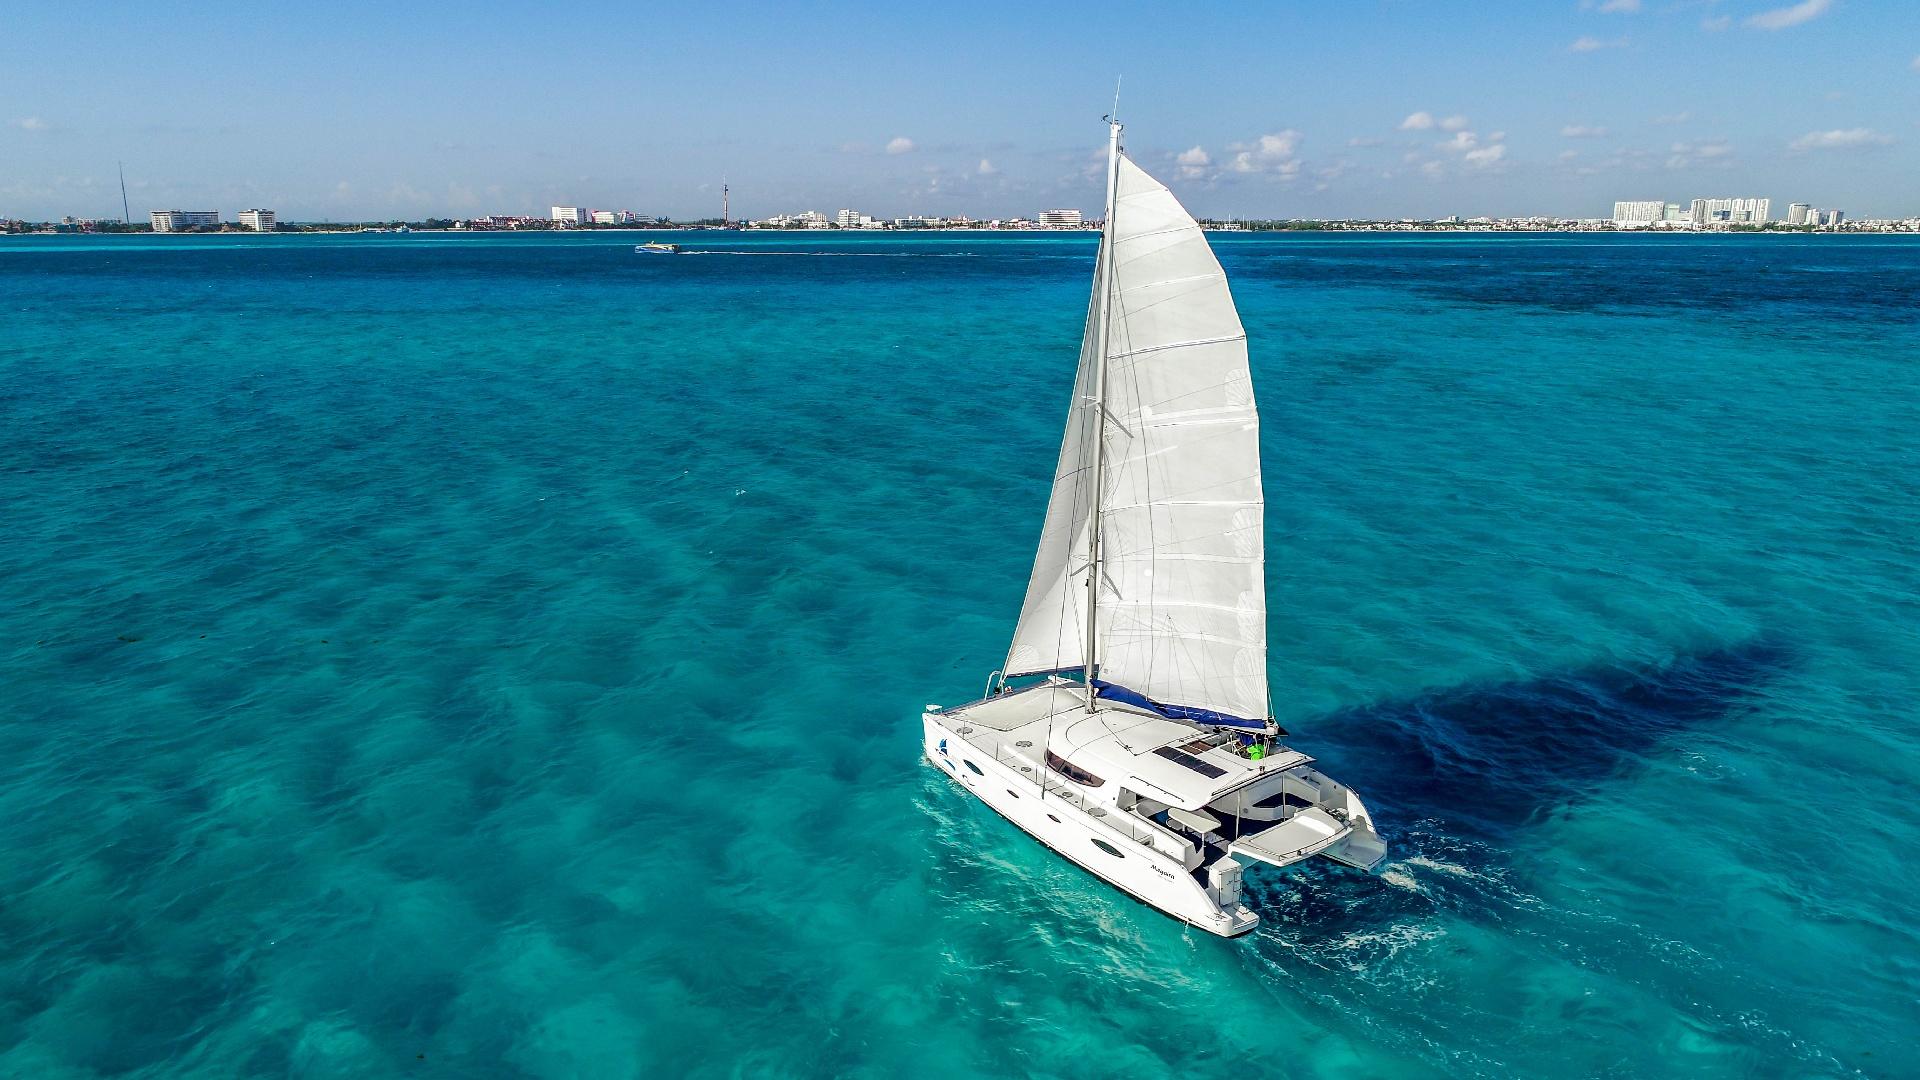 5 - LowRes Megaira- Private tour to Isla Mujeres in catamaran - Cancun Sailing